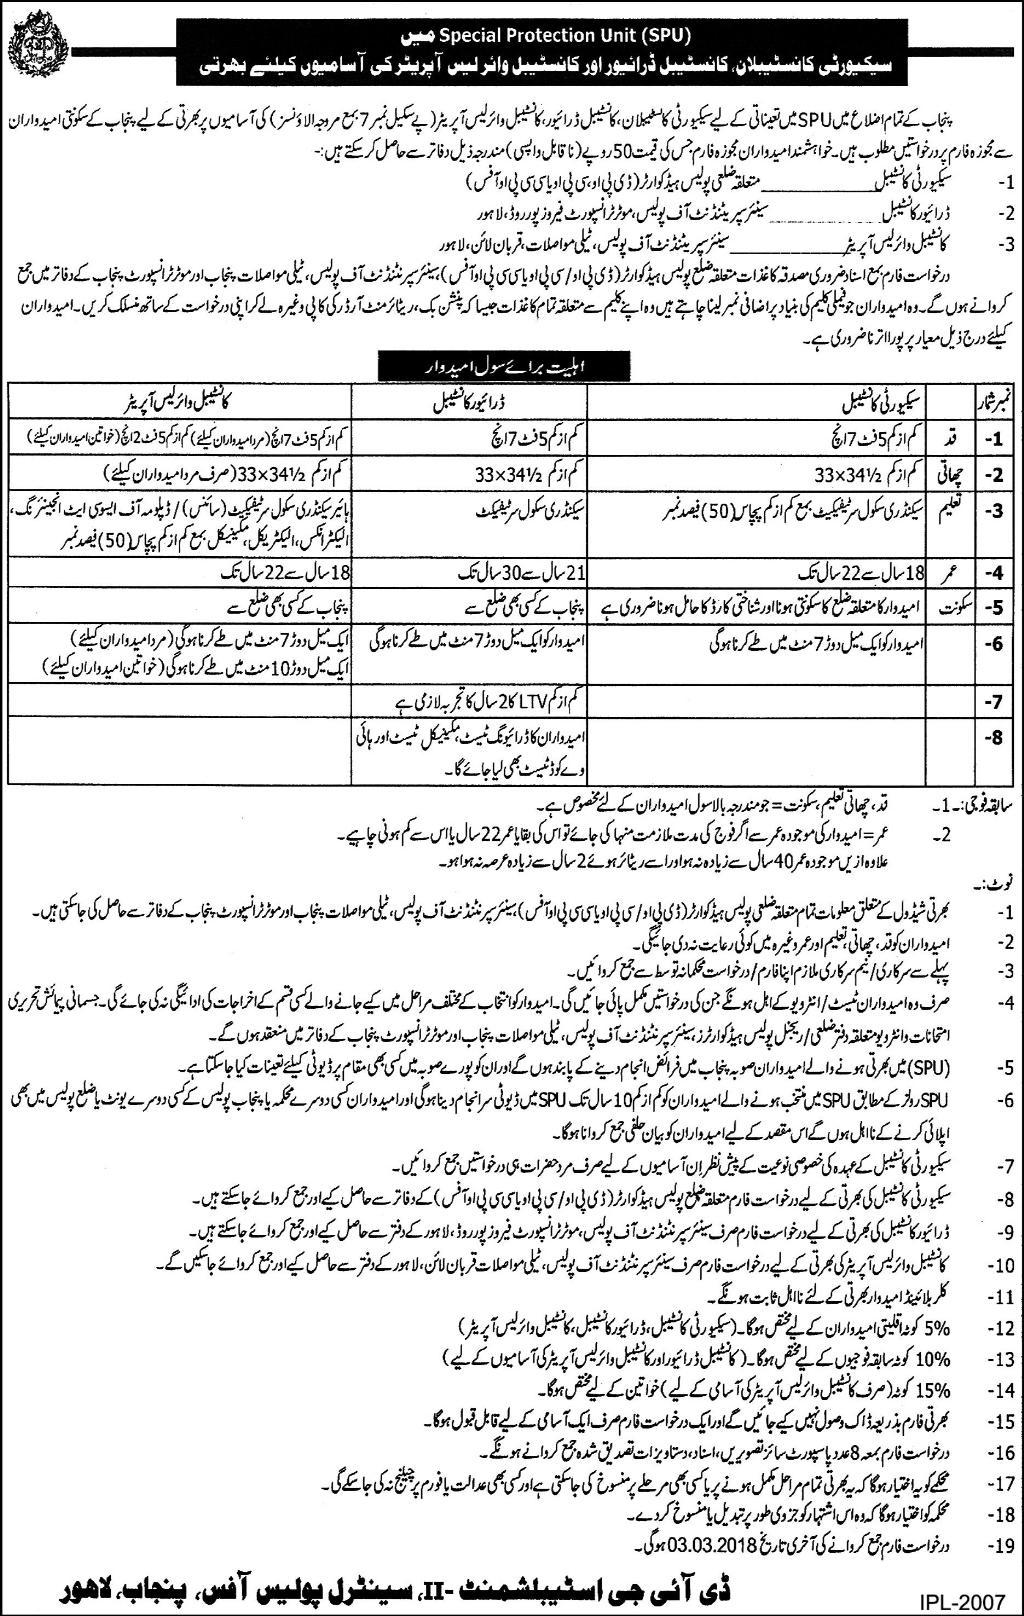 SPU Punjab Police Constable Jobs 2018 Application Form Fee